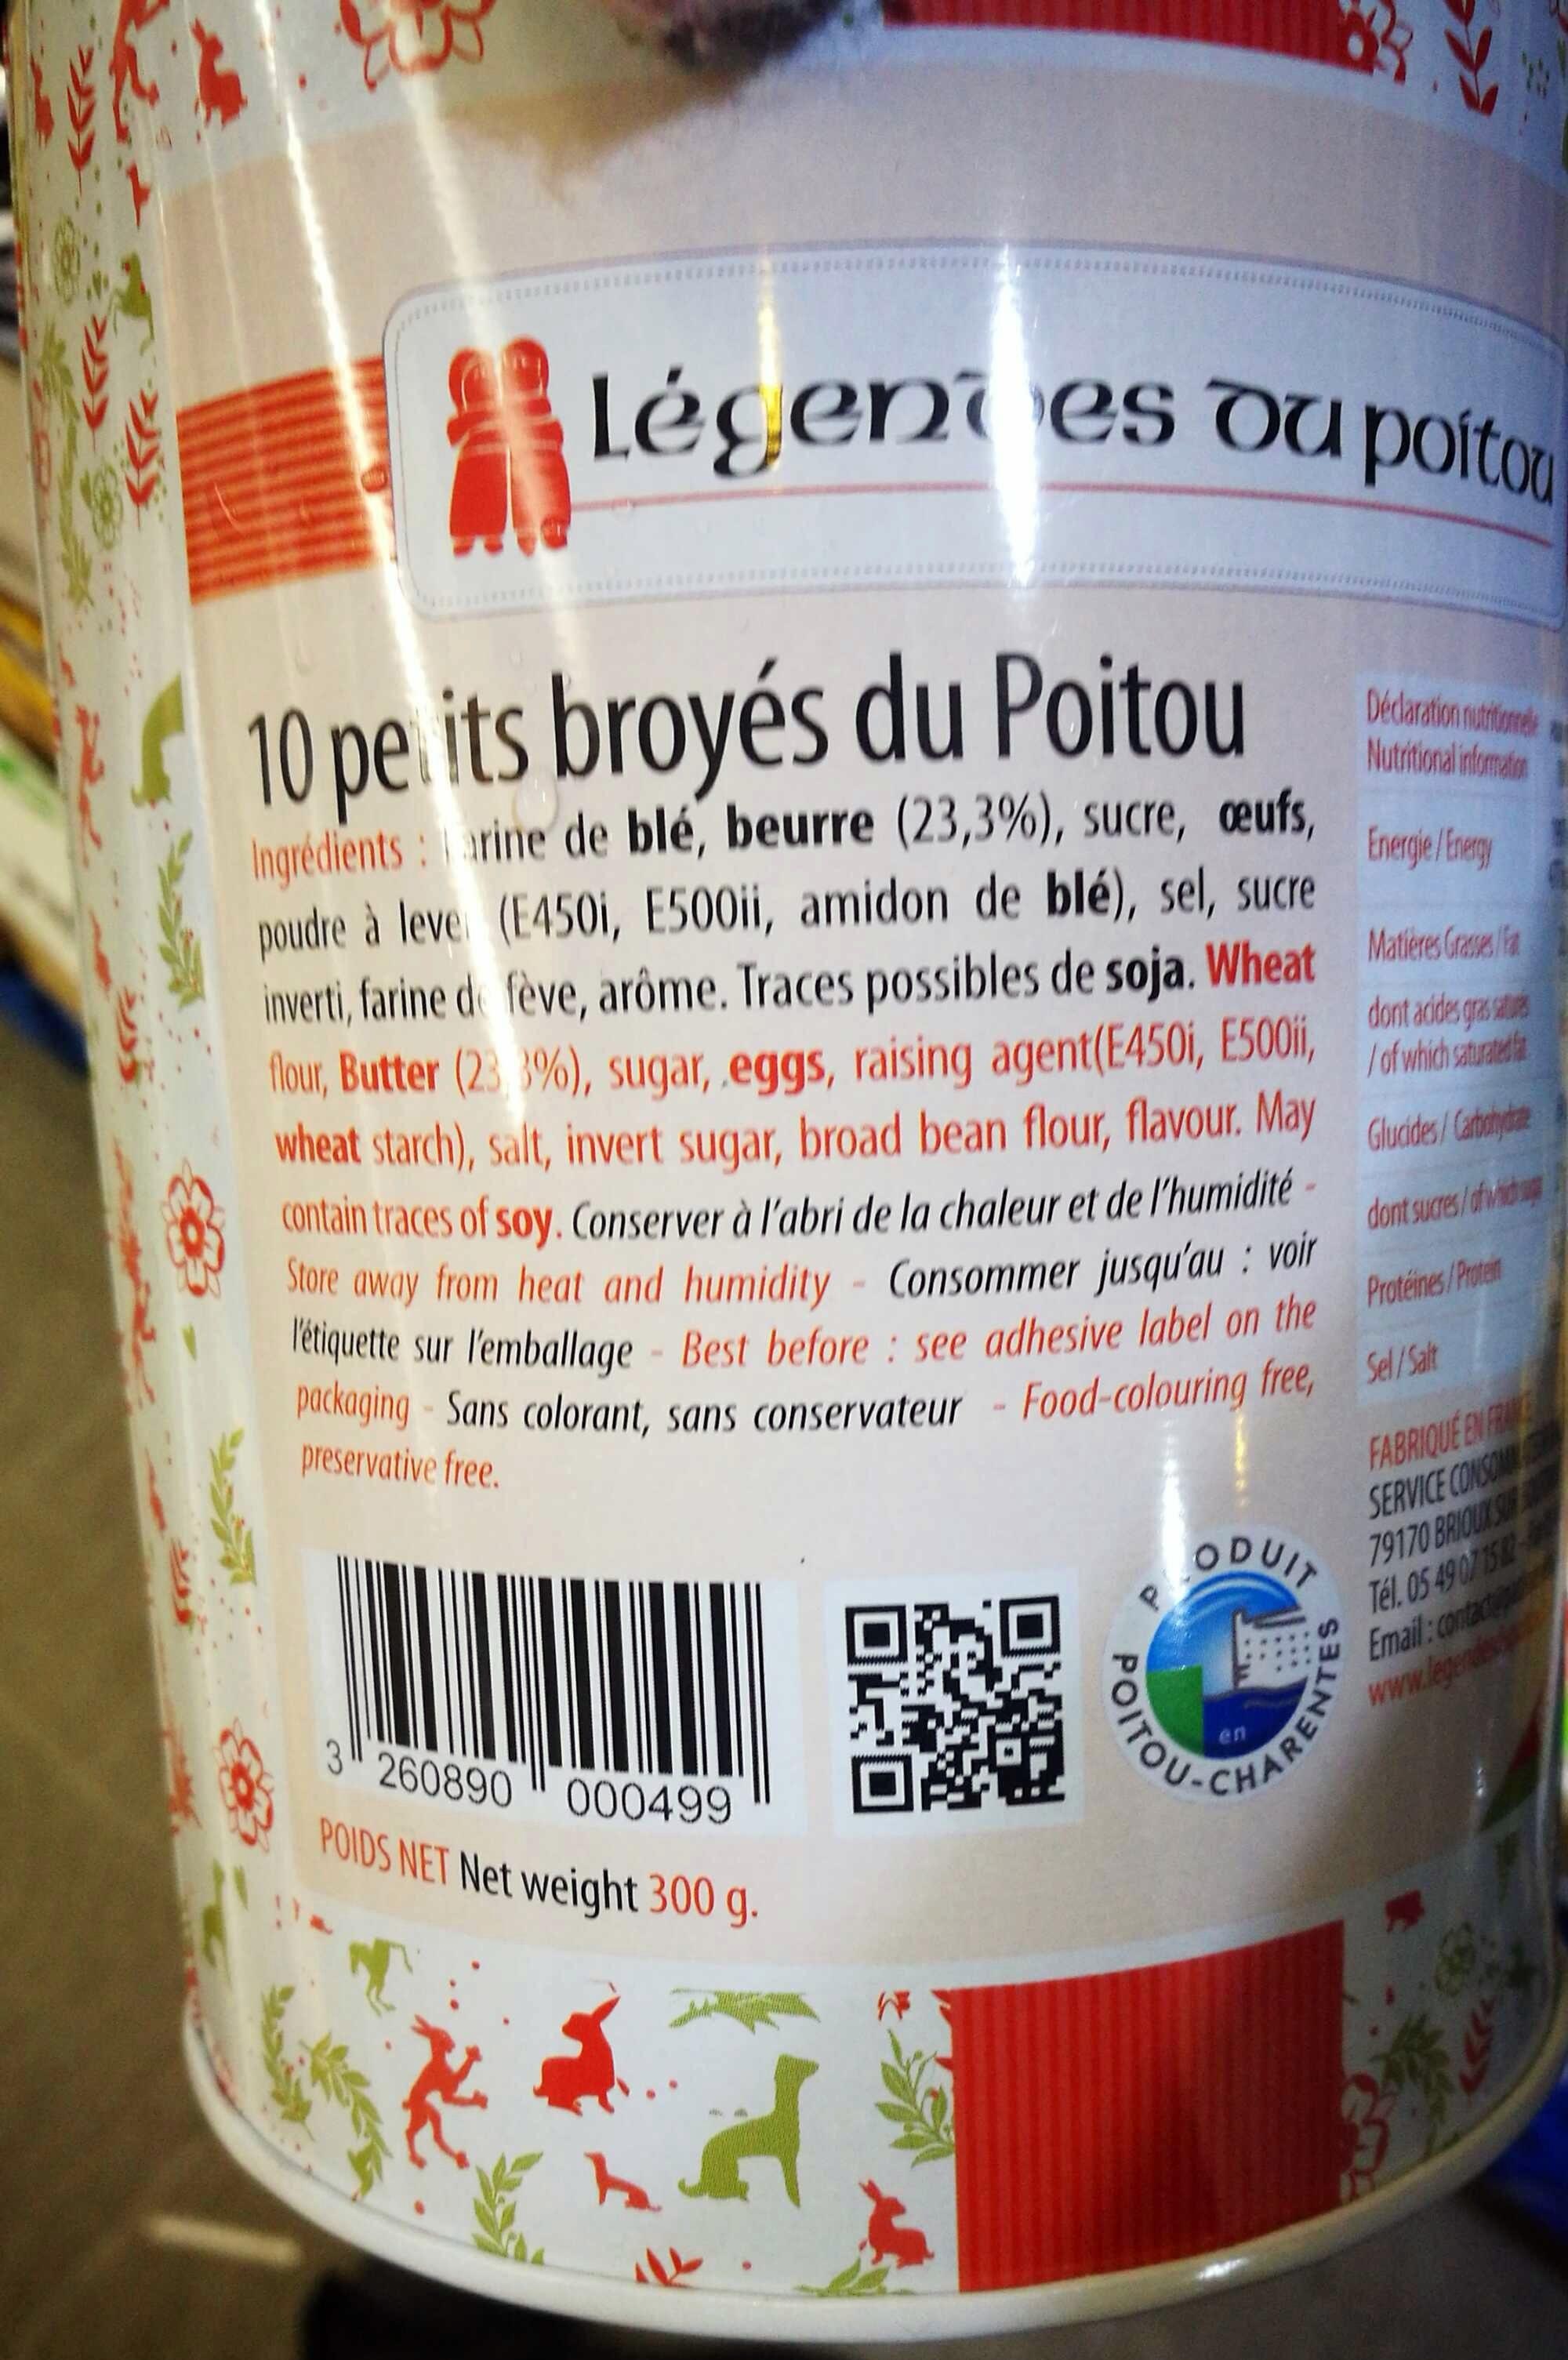 Petite broyes du poitou - Product